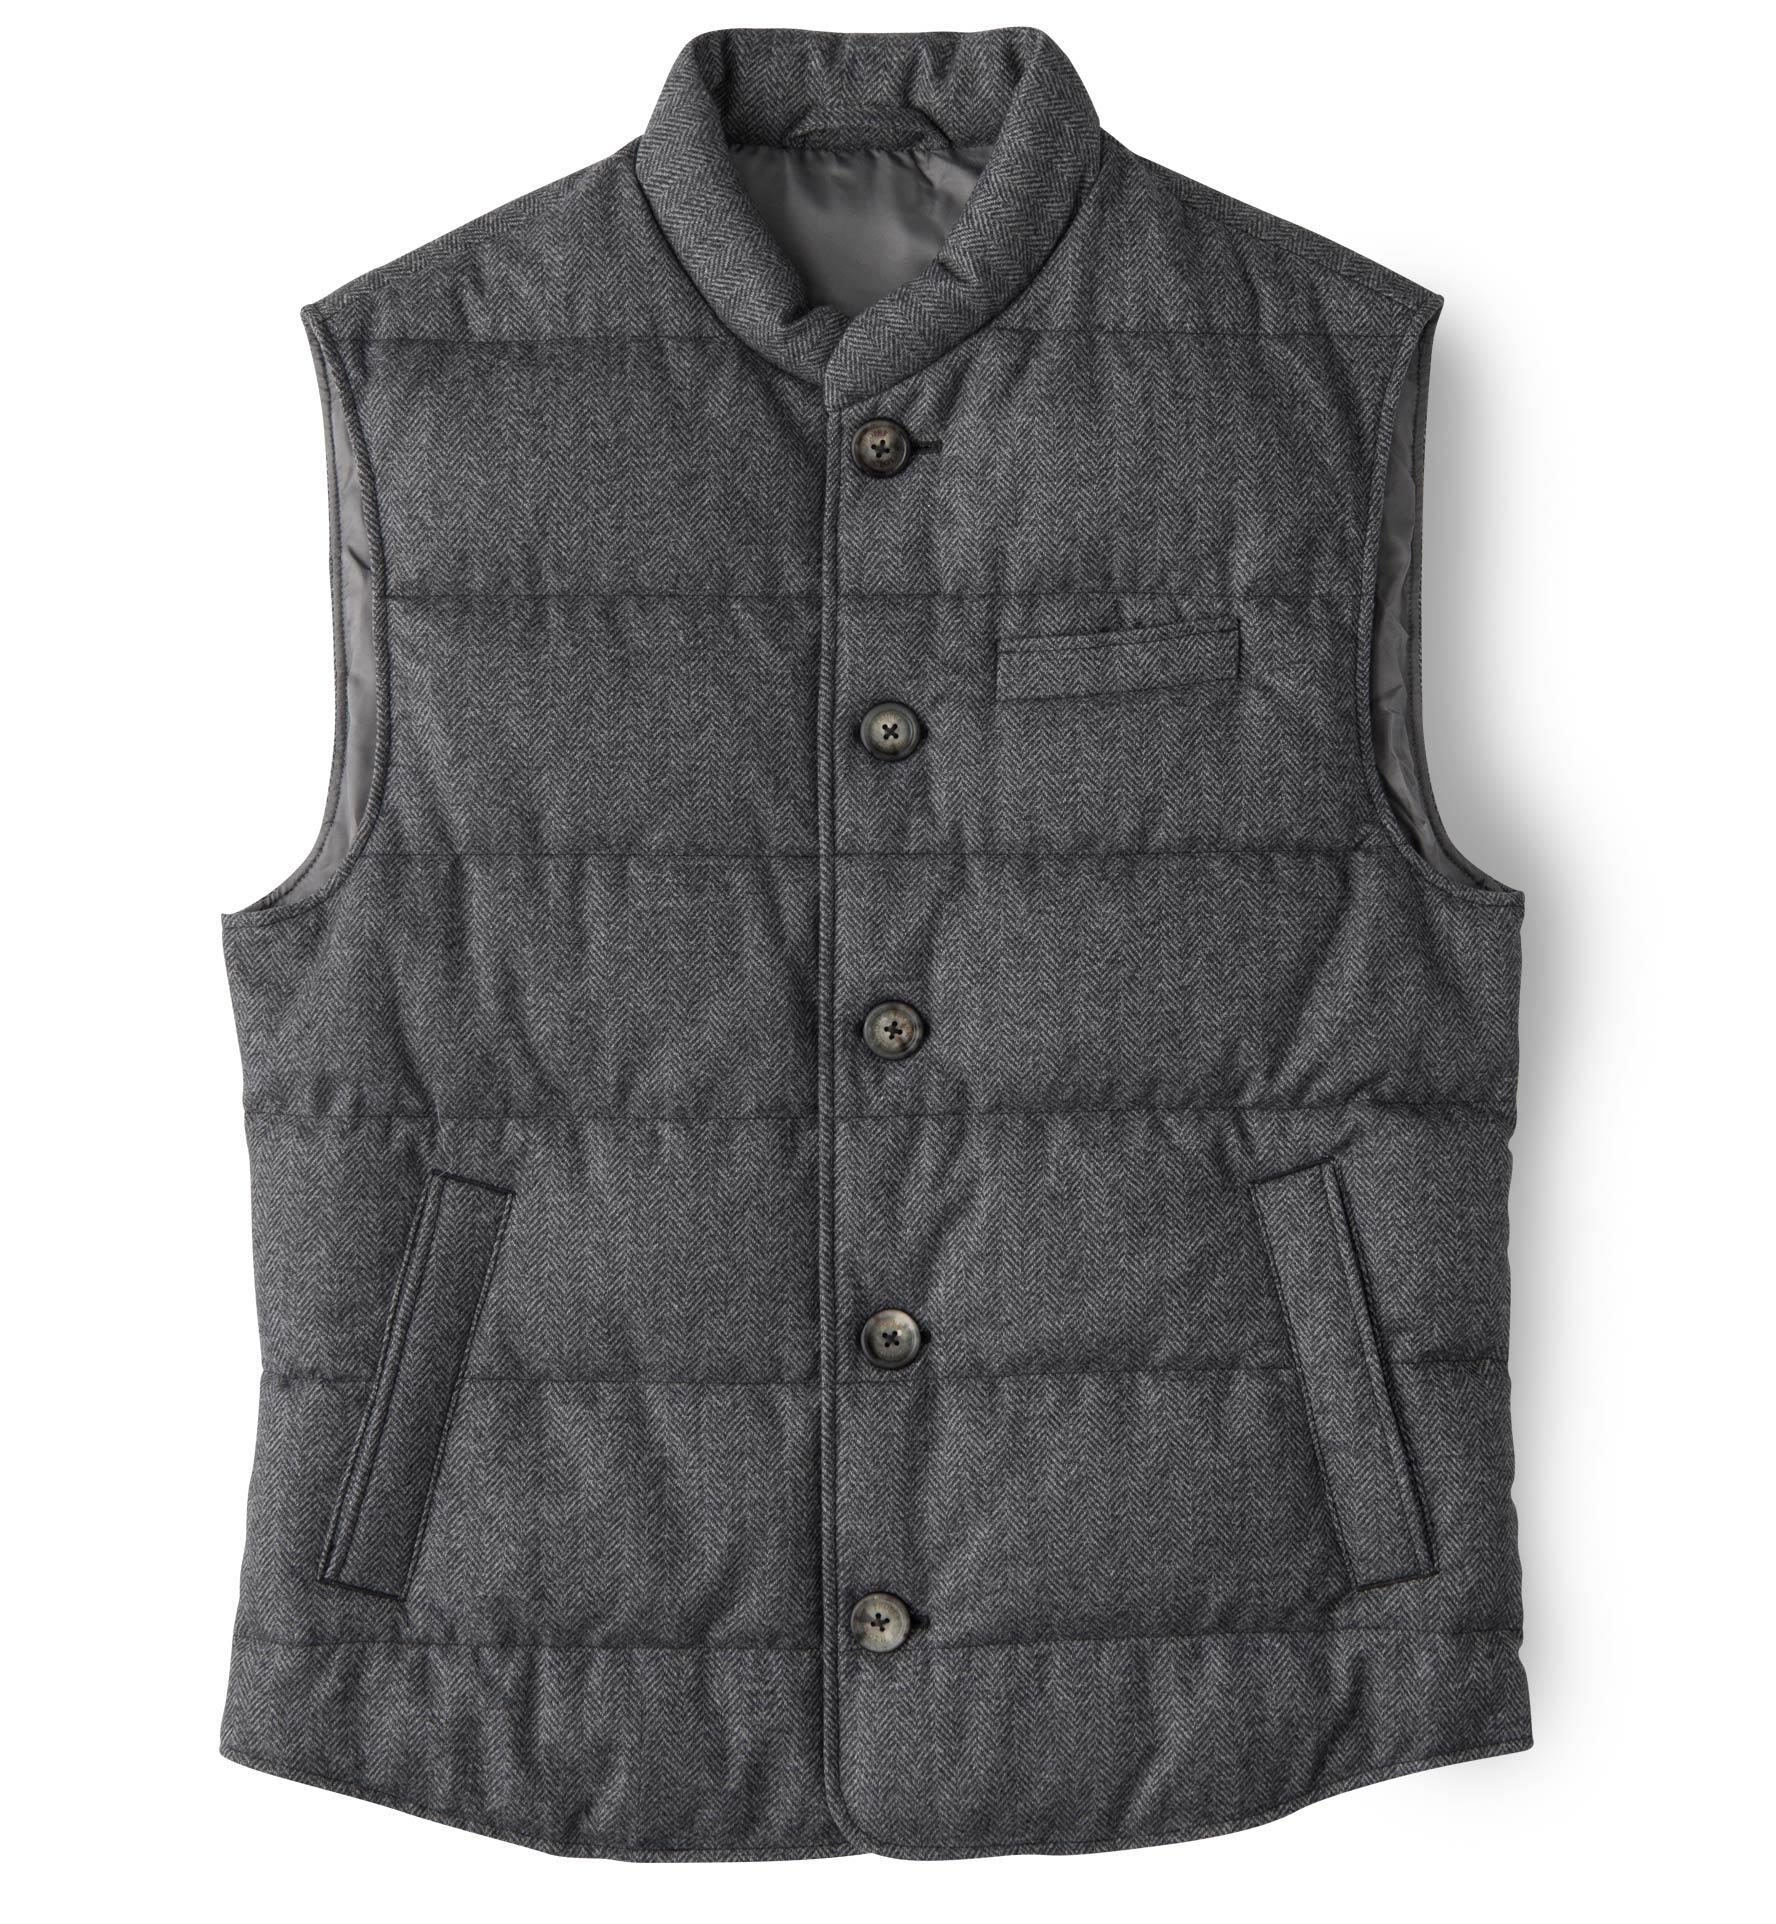 Zoom Image of Cortina Grey Herringbone Wool Button Vest